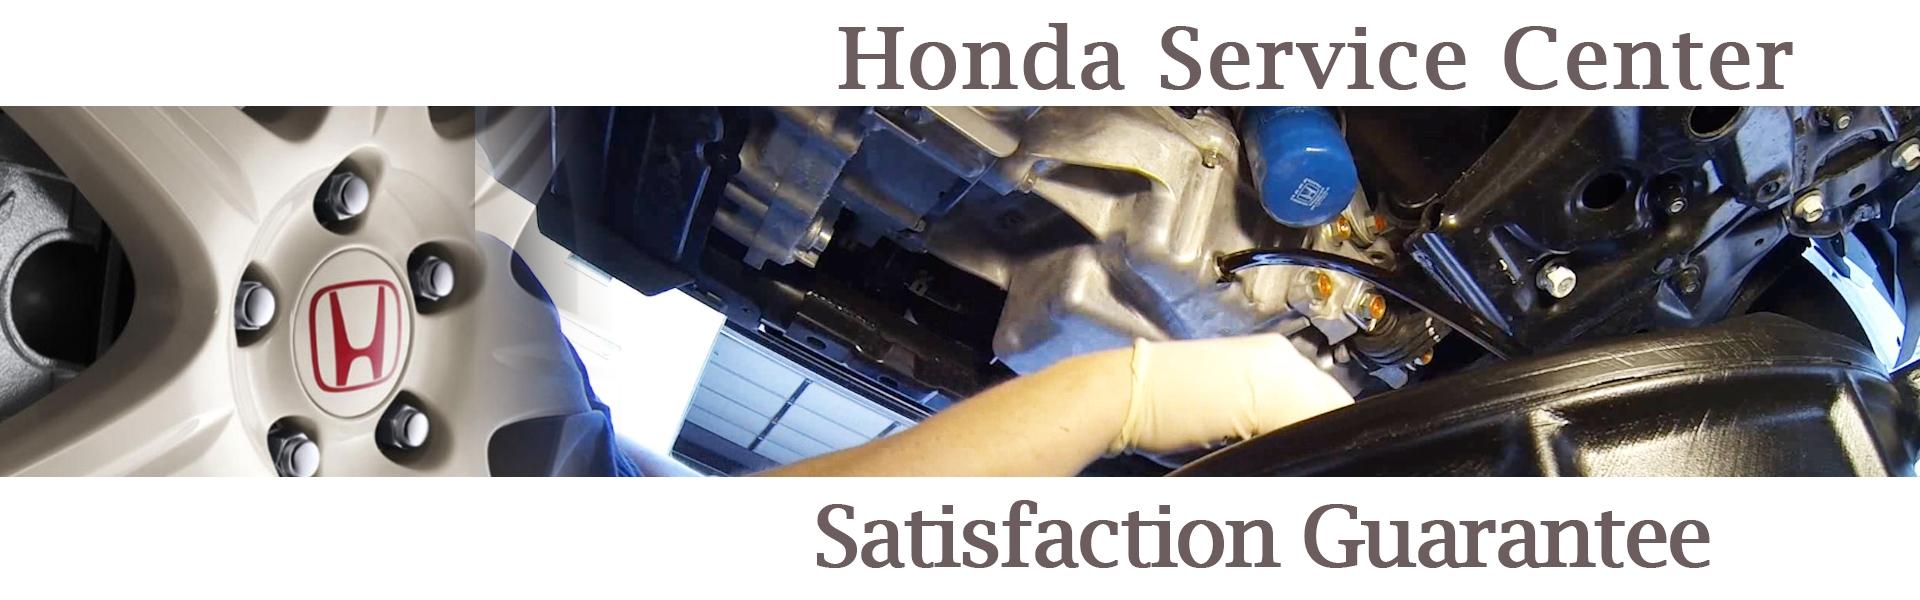 Genuine Honda Service